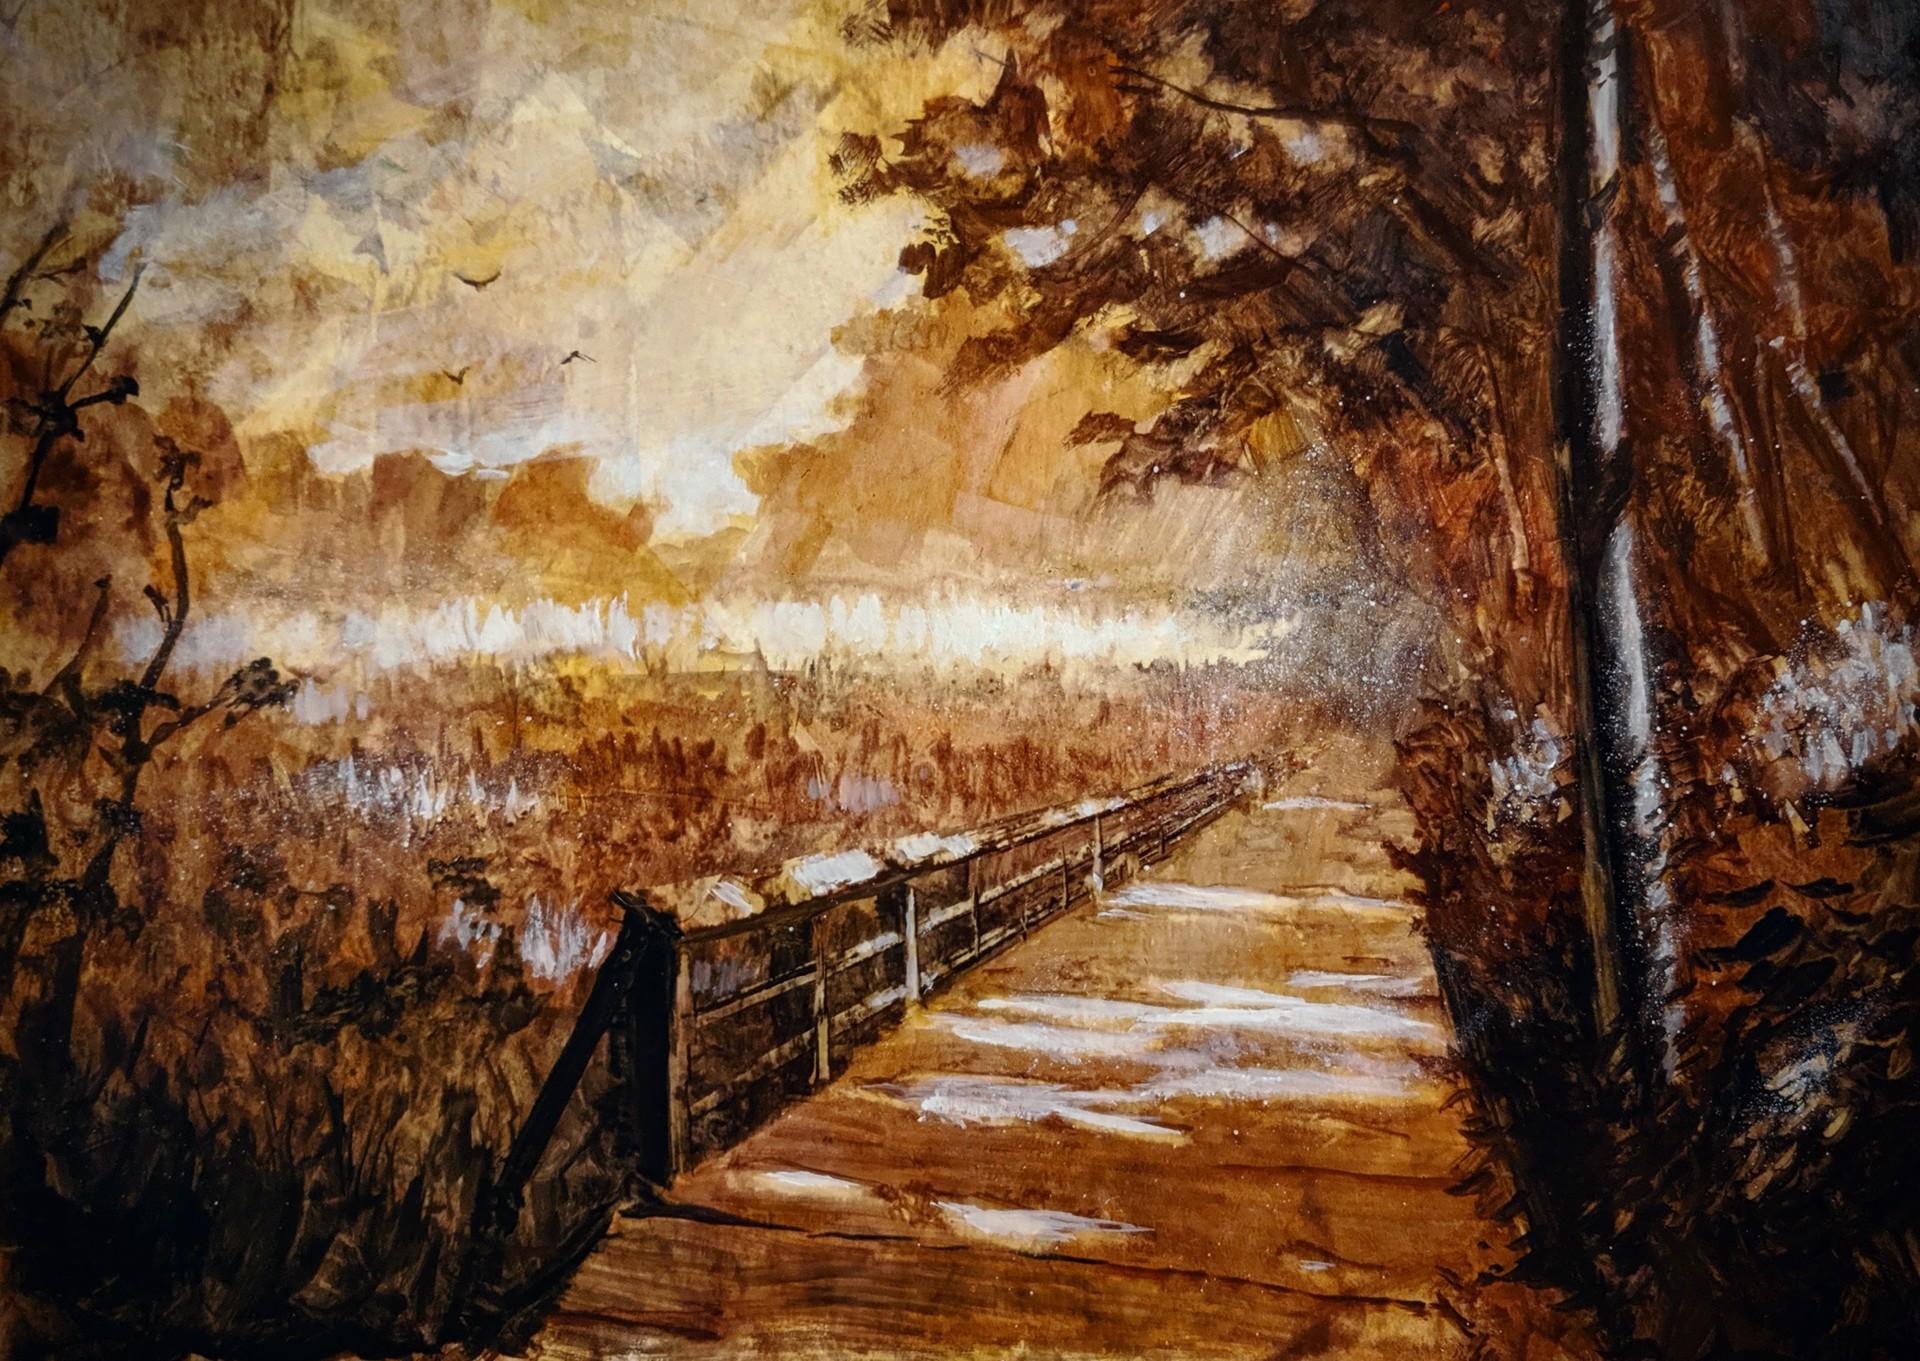 Bridge Through the Field by Christopher Clark